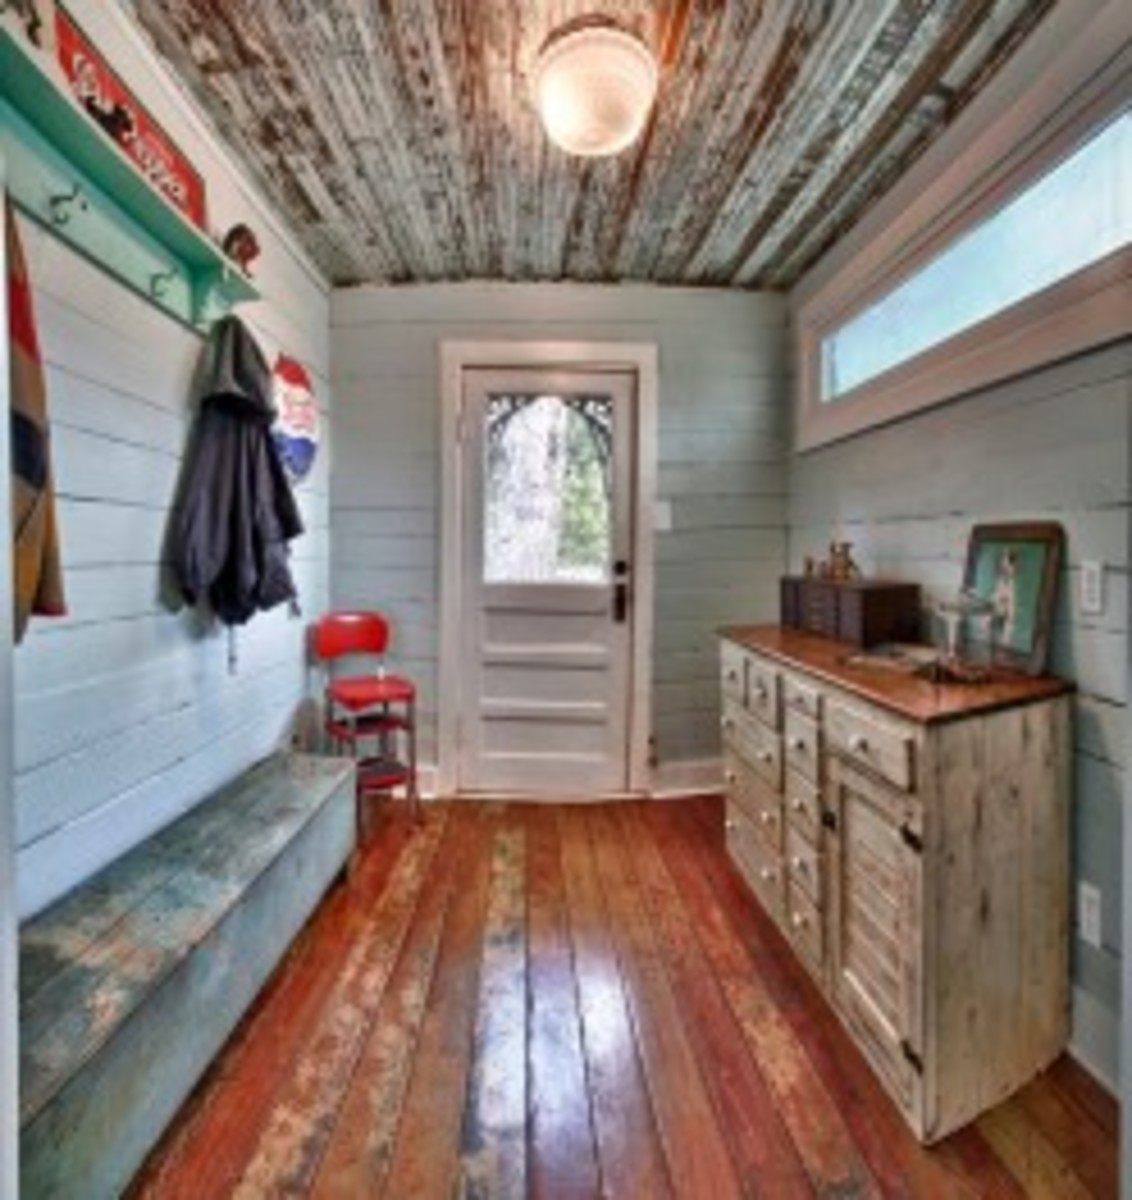 Rustic Sideboard and Distressed Floors